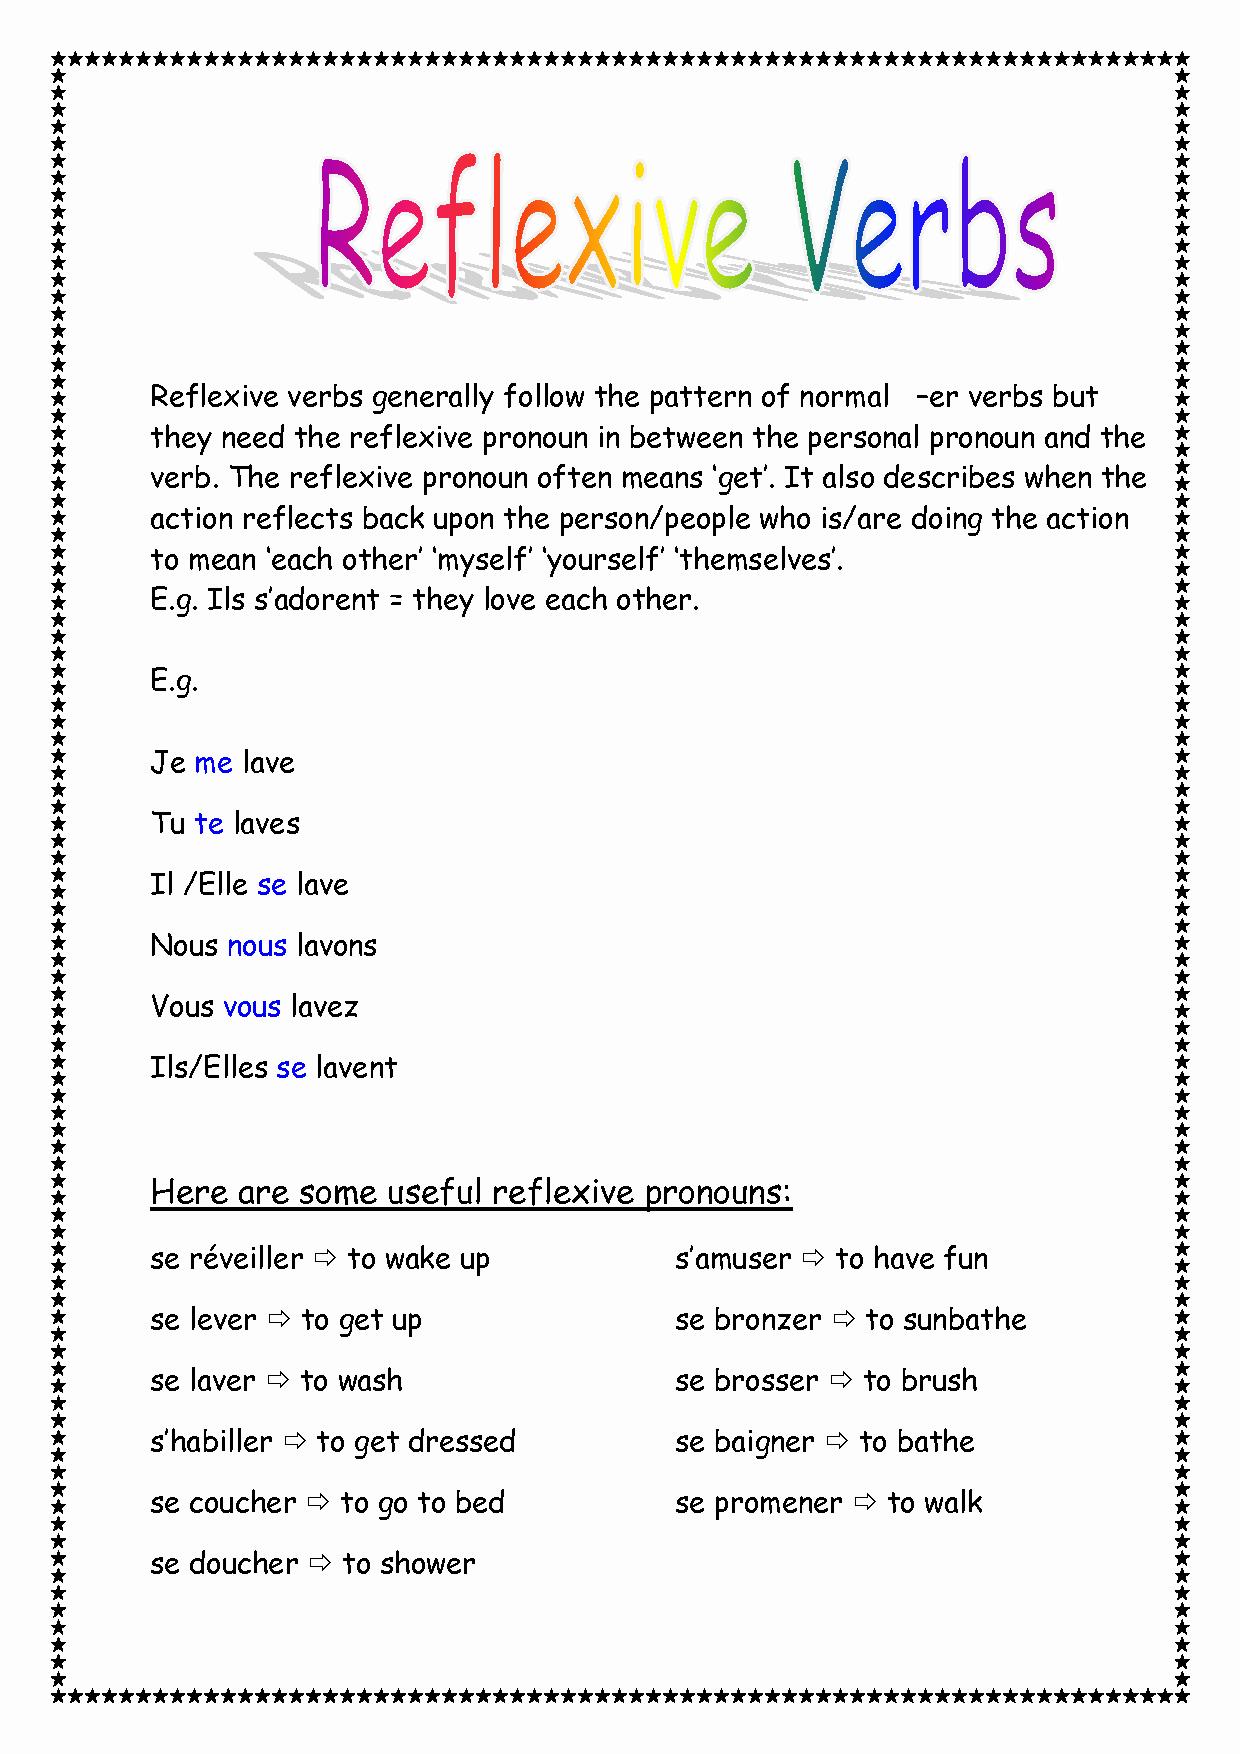 Spanish Reflexive Verbs Worksheet Printable Beautiful 26 Reflexive Verbs Spanish Worksheet Worksheet Project List